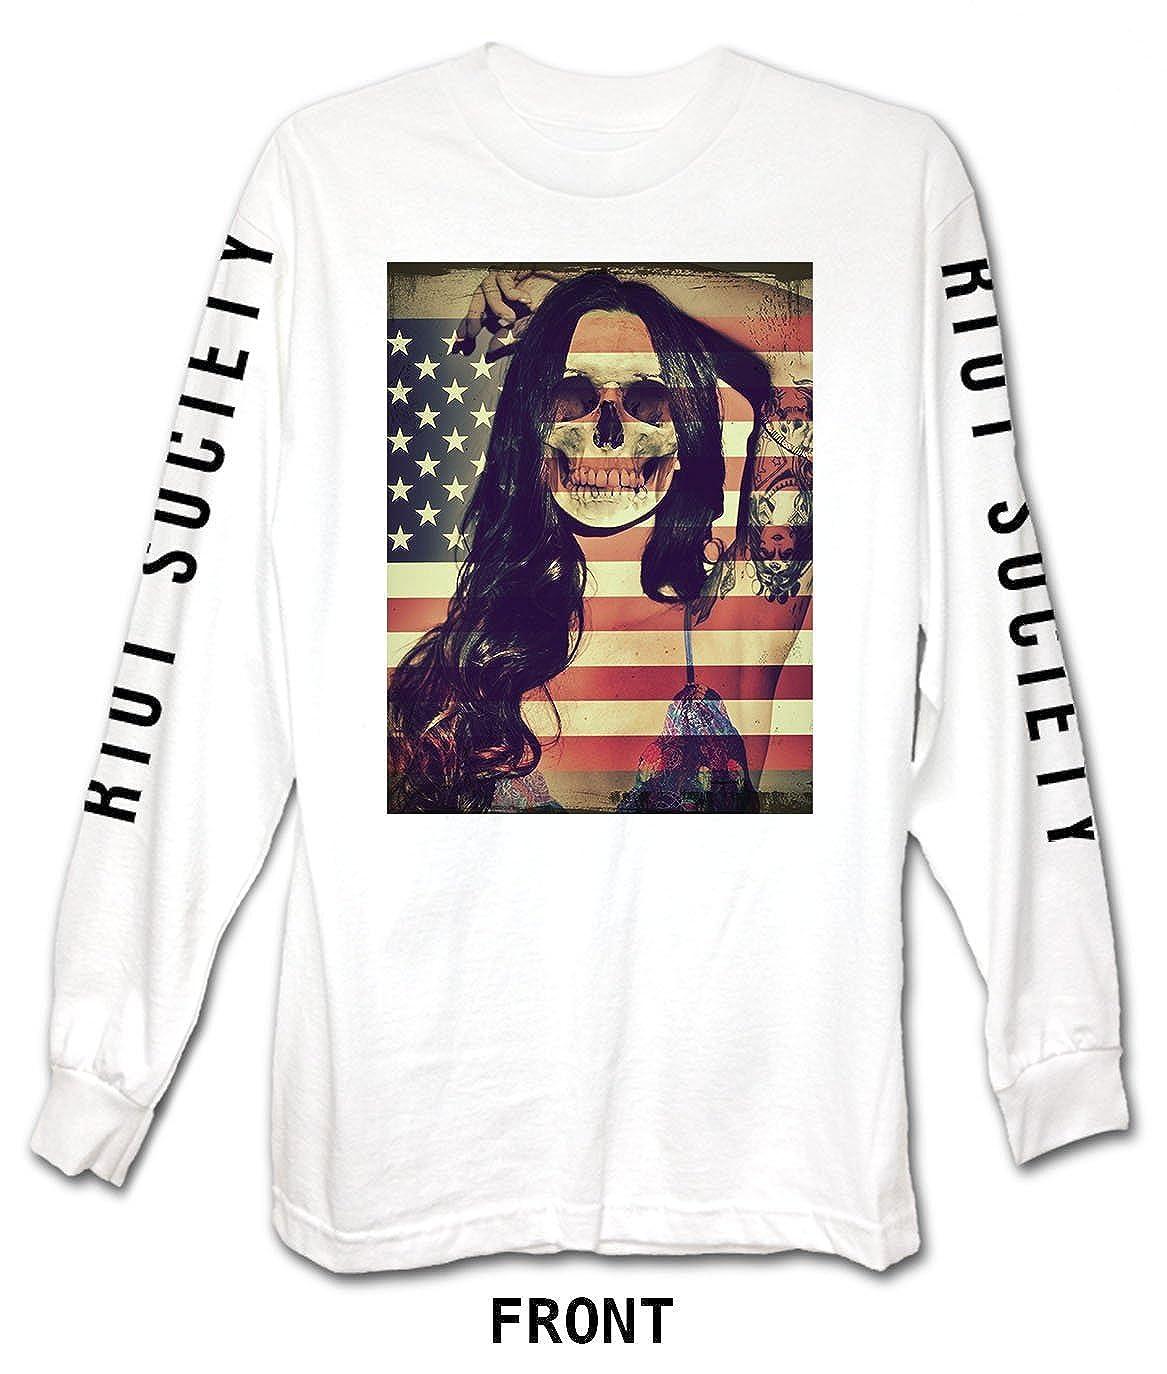 9156e678b243 Amazon.com: Riot Society Men's Long Sleeve Graphic Fashion T-Shirt: Clothing